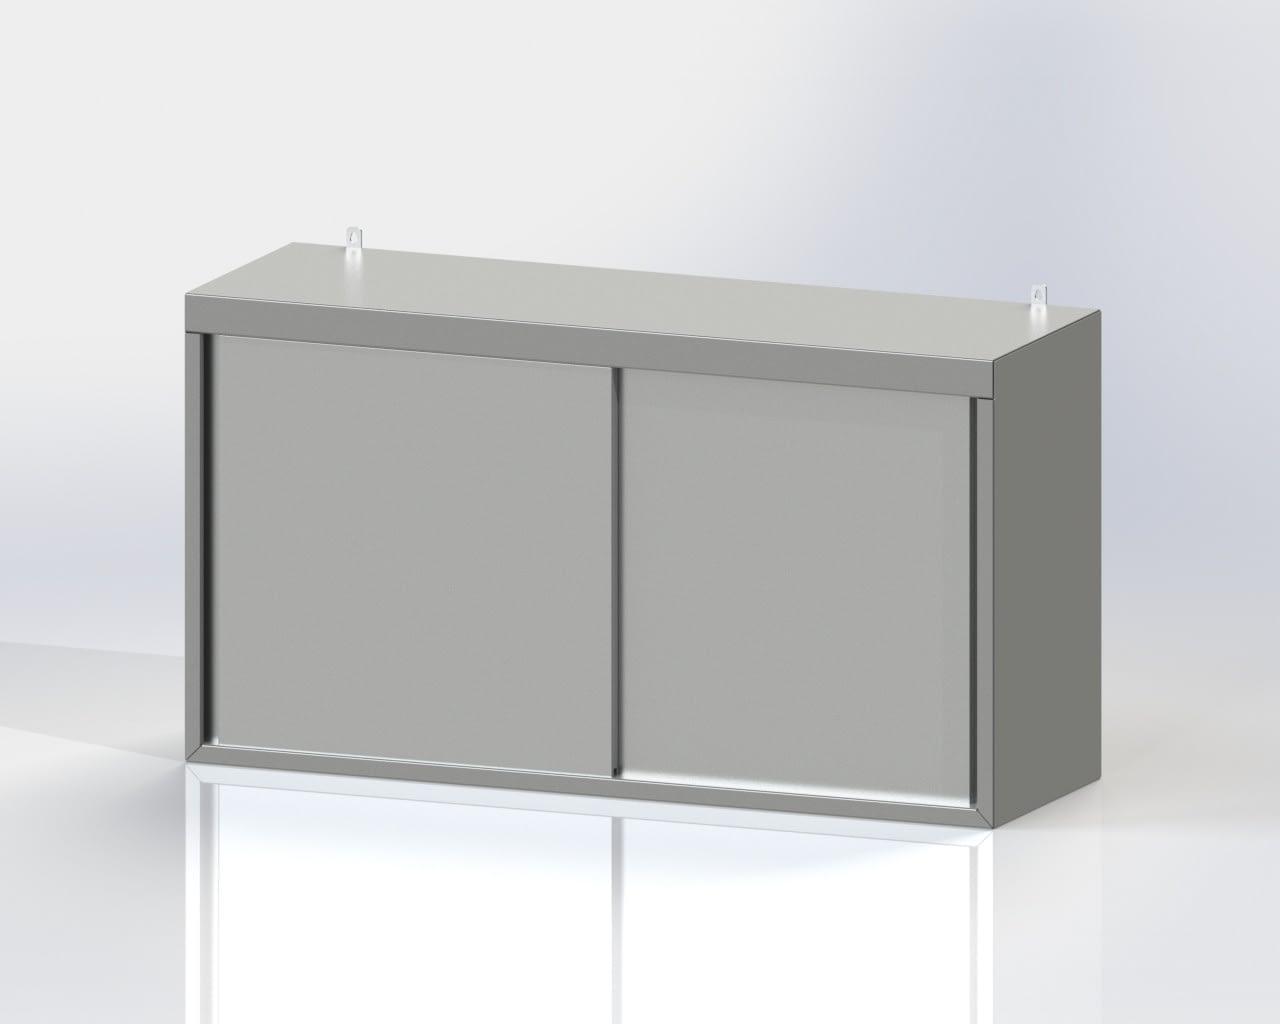 Wall Mount Cupboard/Sliding Doors